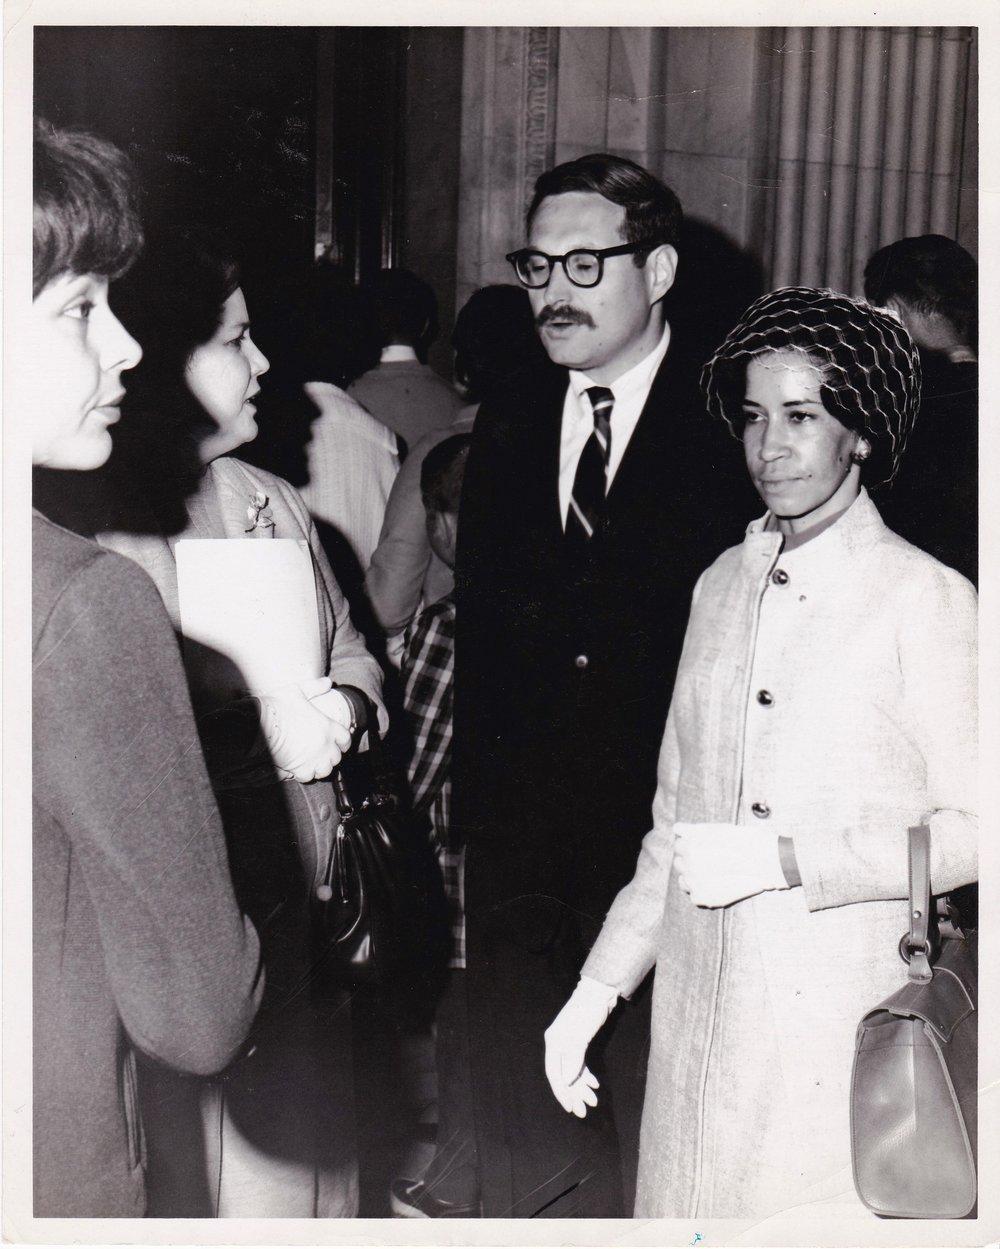 Senate Subcommittee Hearing in 1968, Patricia Morris '67, Alice Geoffray, Stephen Ebbins, Thyra Johnson '66